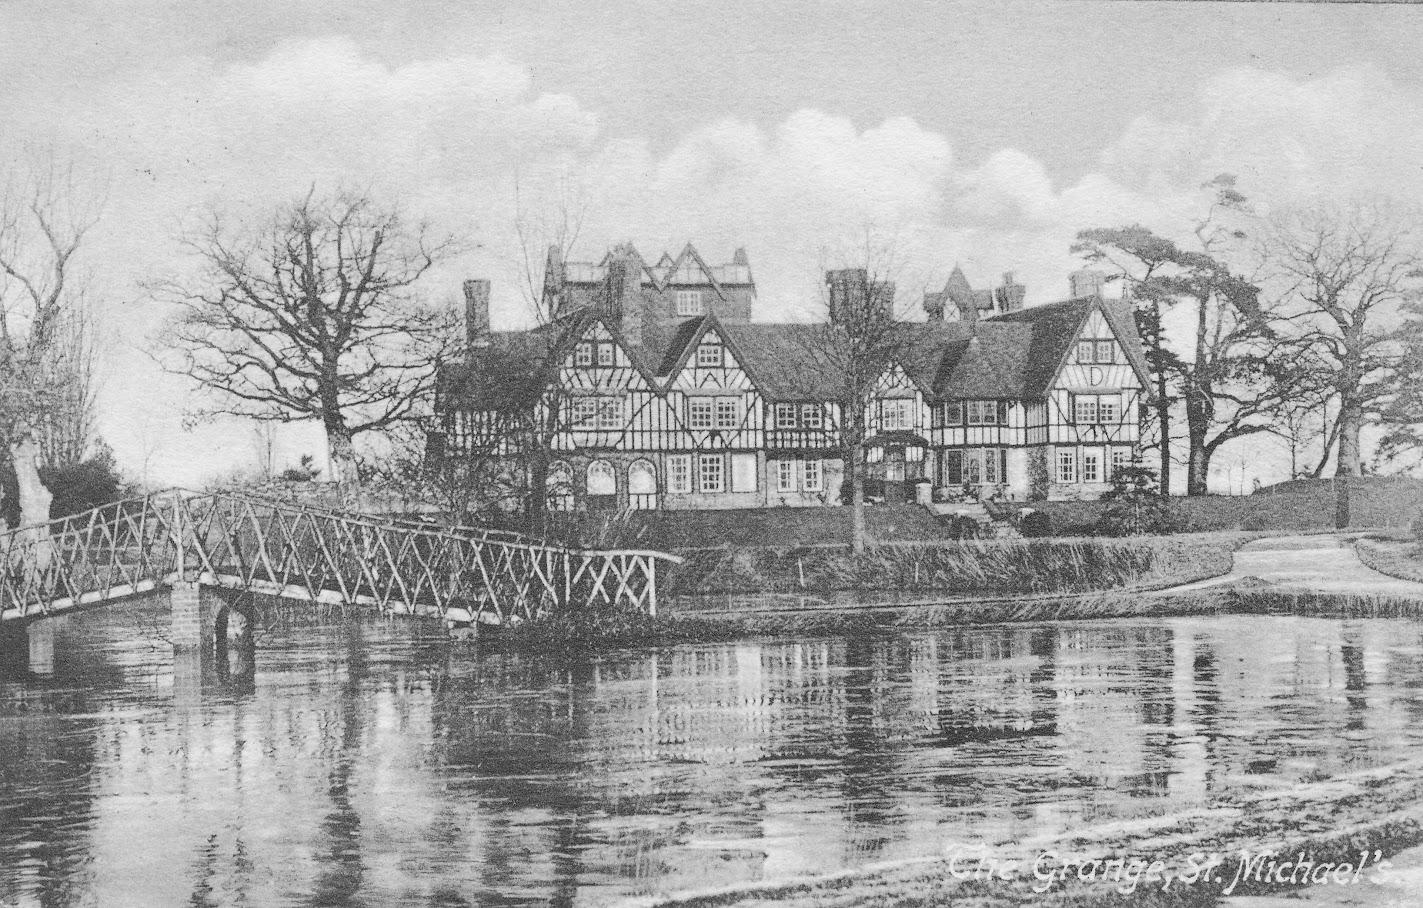 St Michaels Grange, Tenterden